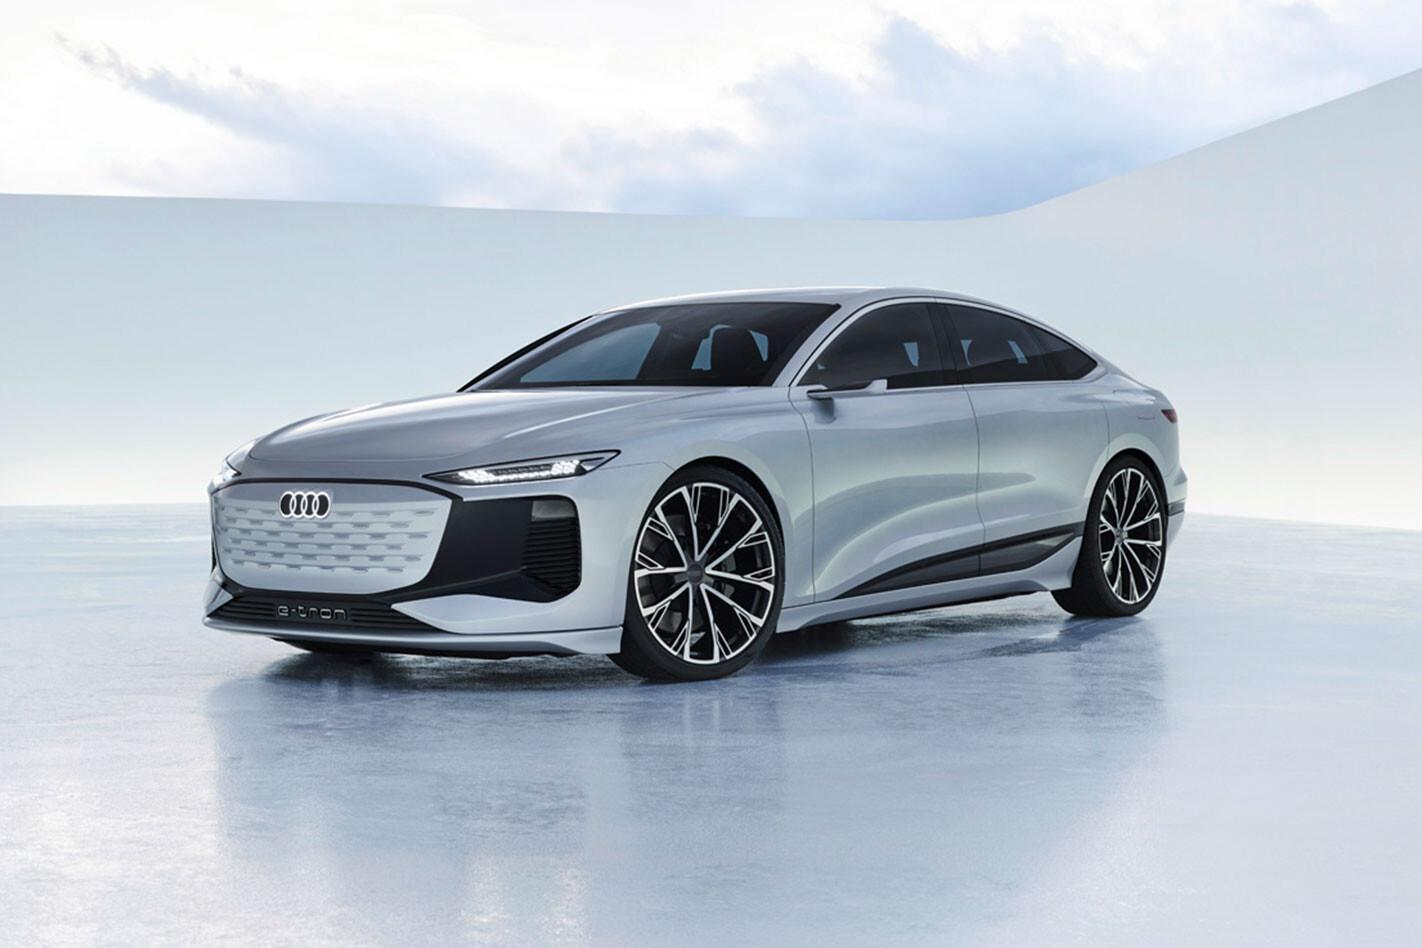 2021 Audi A6 E-Tron concept revealed